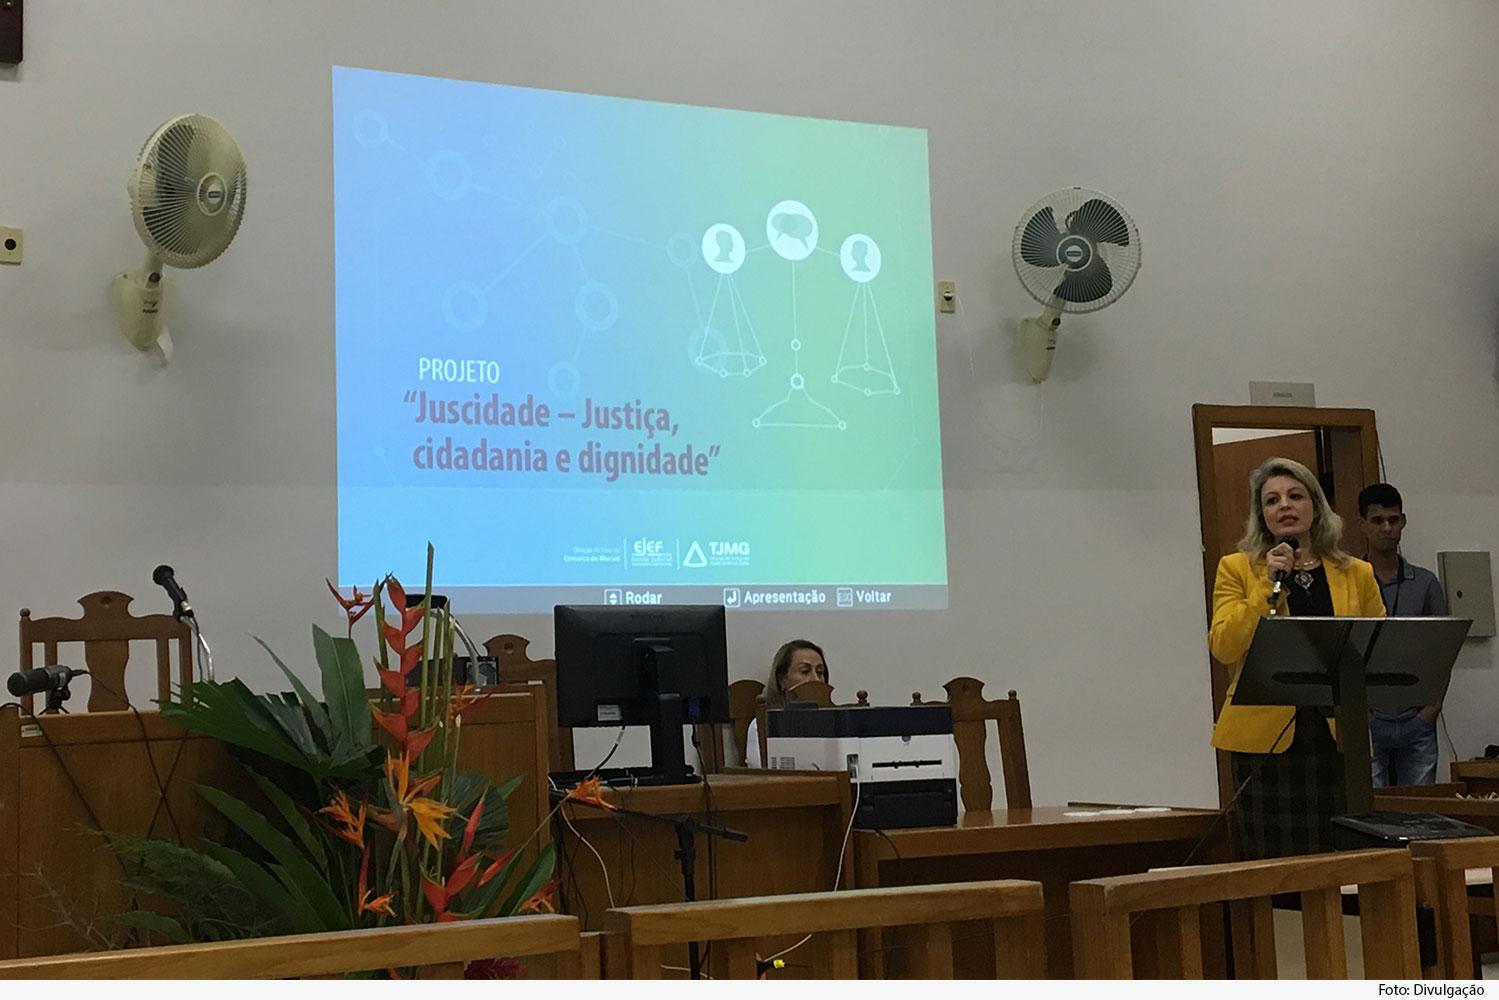 noticia2-palestra-justica-muriae-10.06.jpg